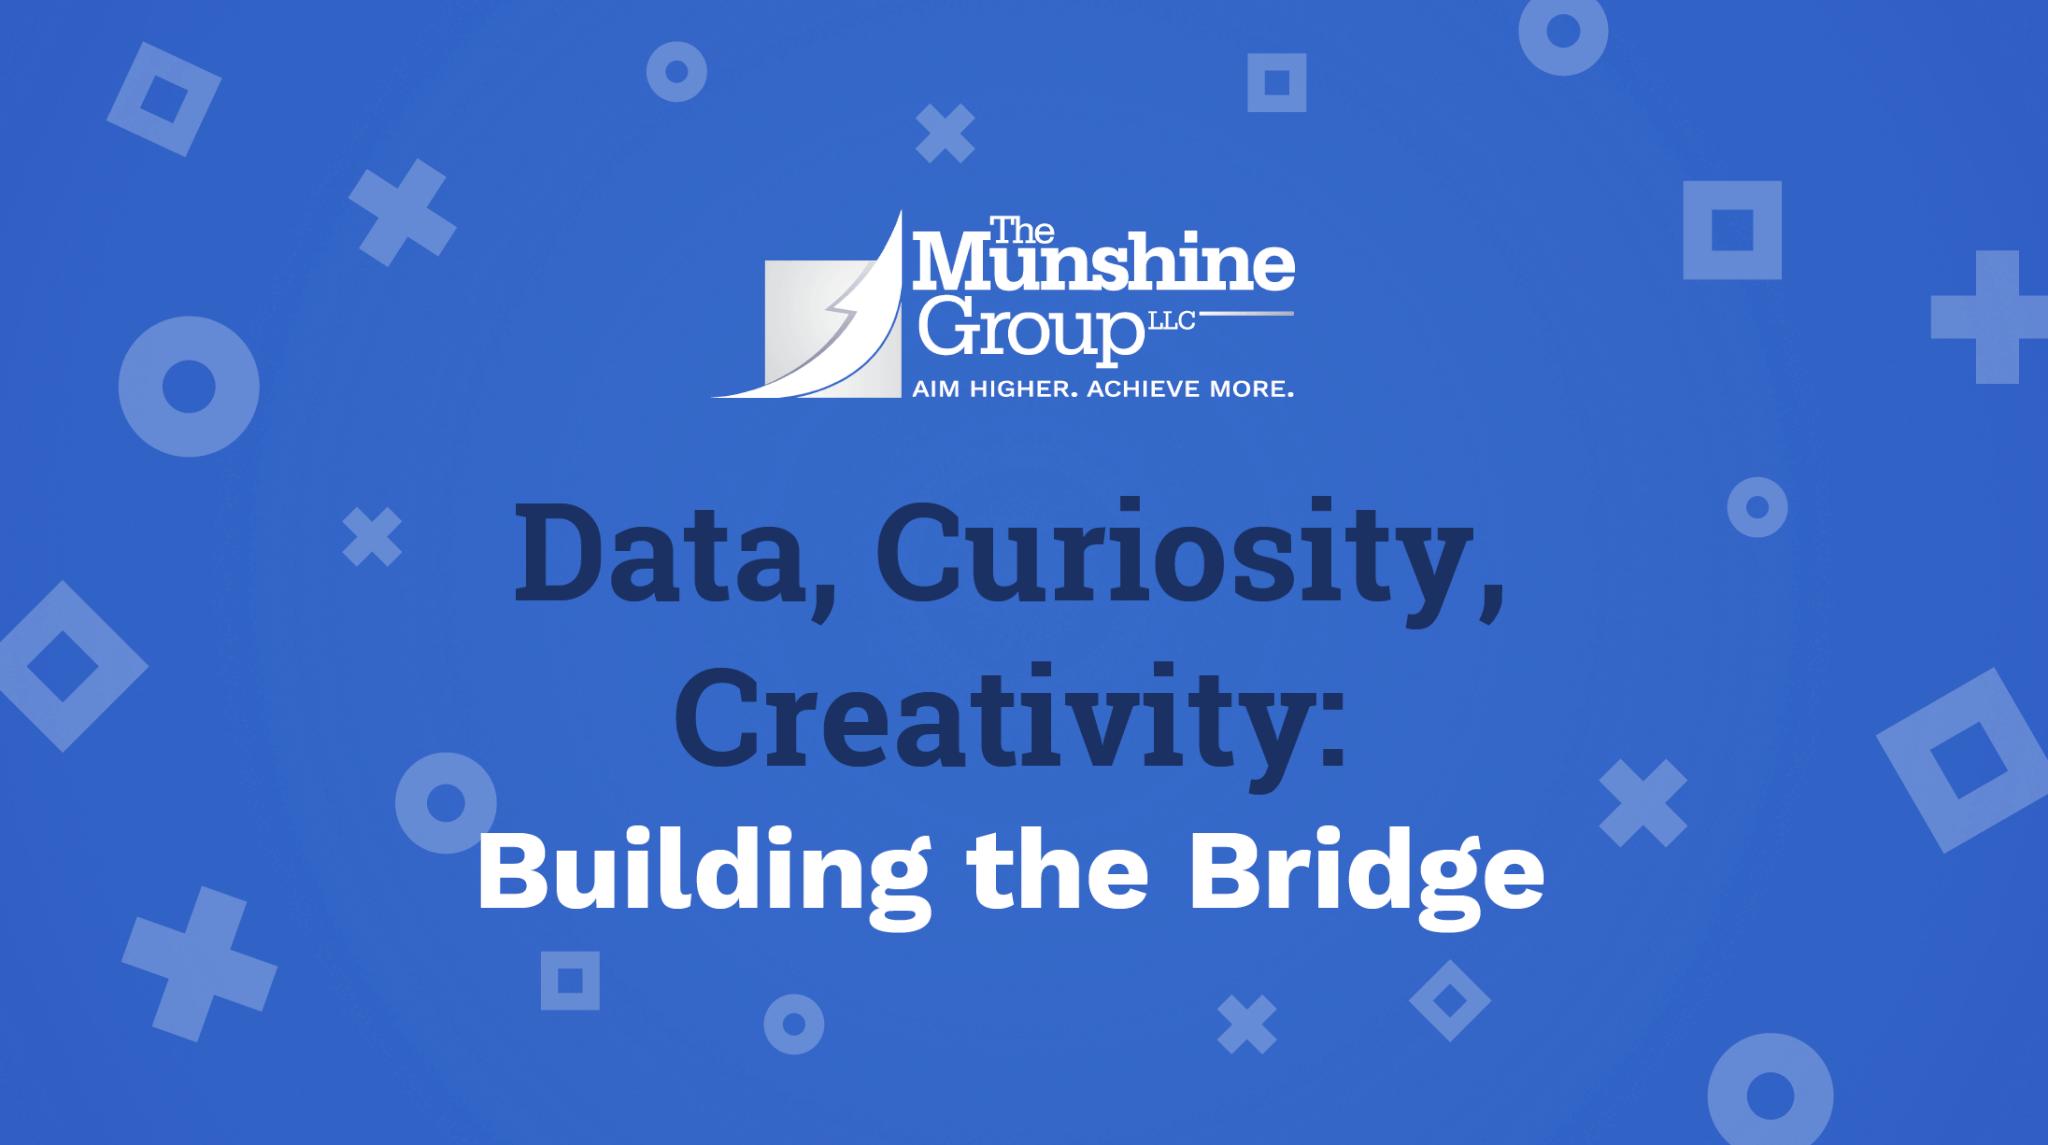 Data, Curiosity, Creativity